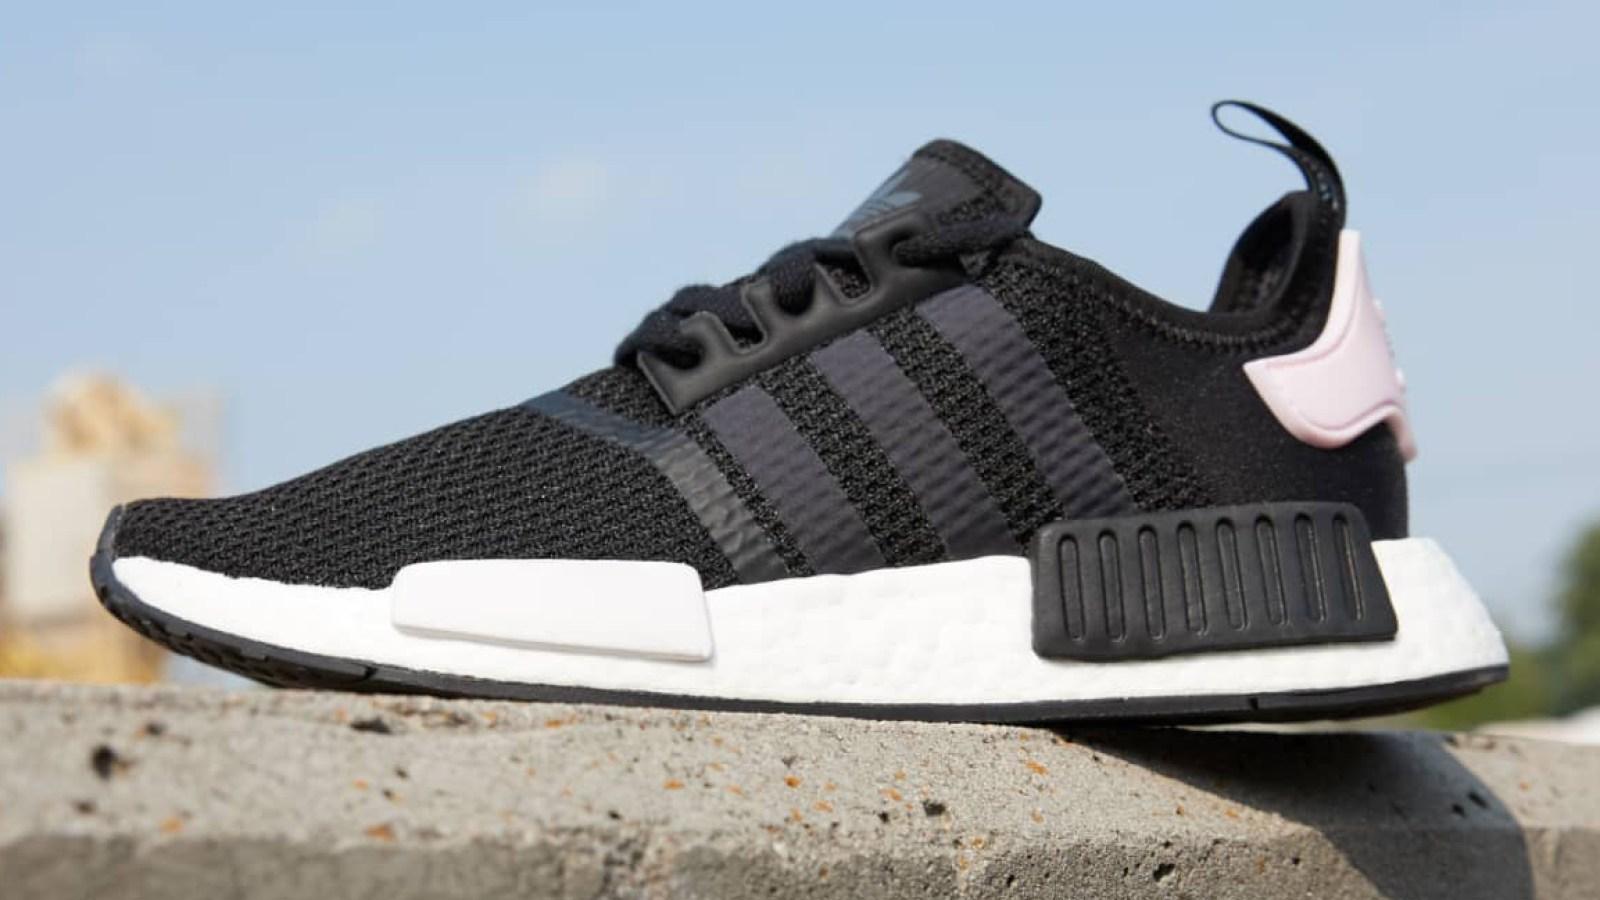 b7a45e11e094e This Stylish Unisex Adidas Sneaker Has Over 1